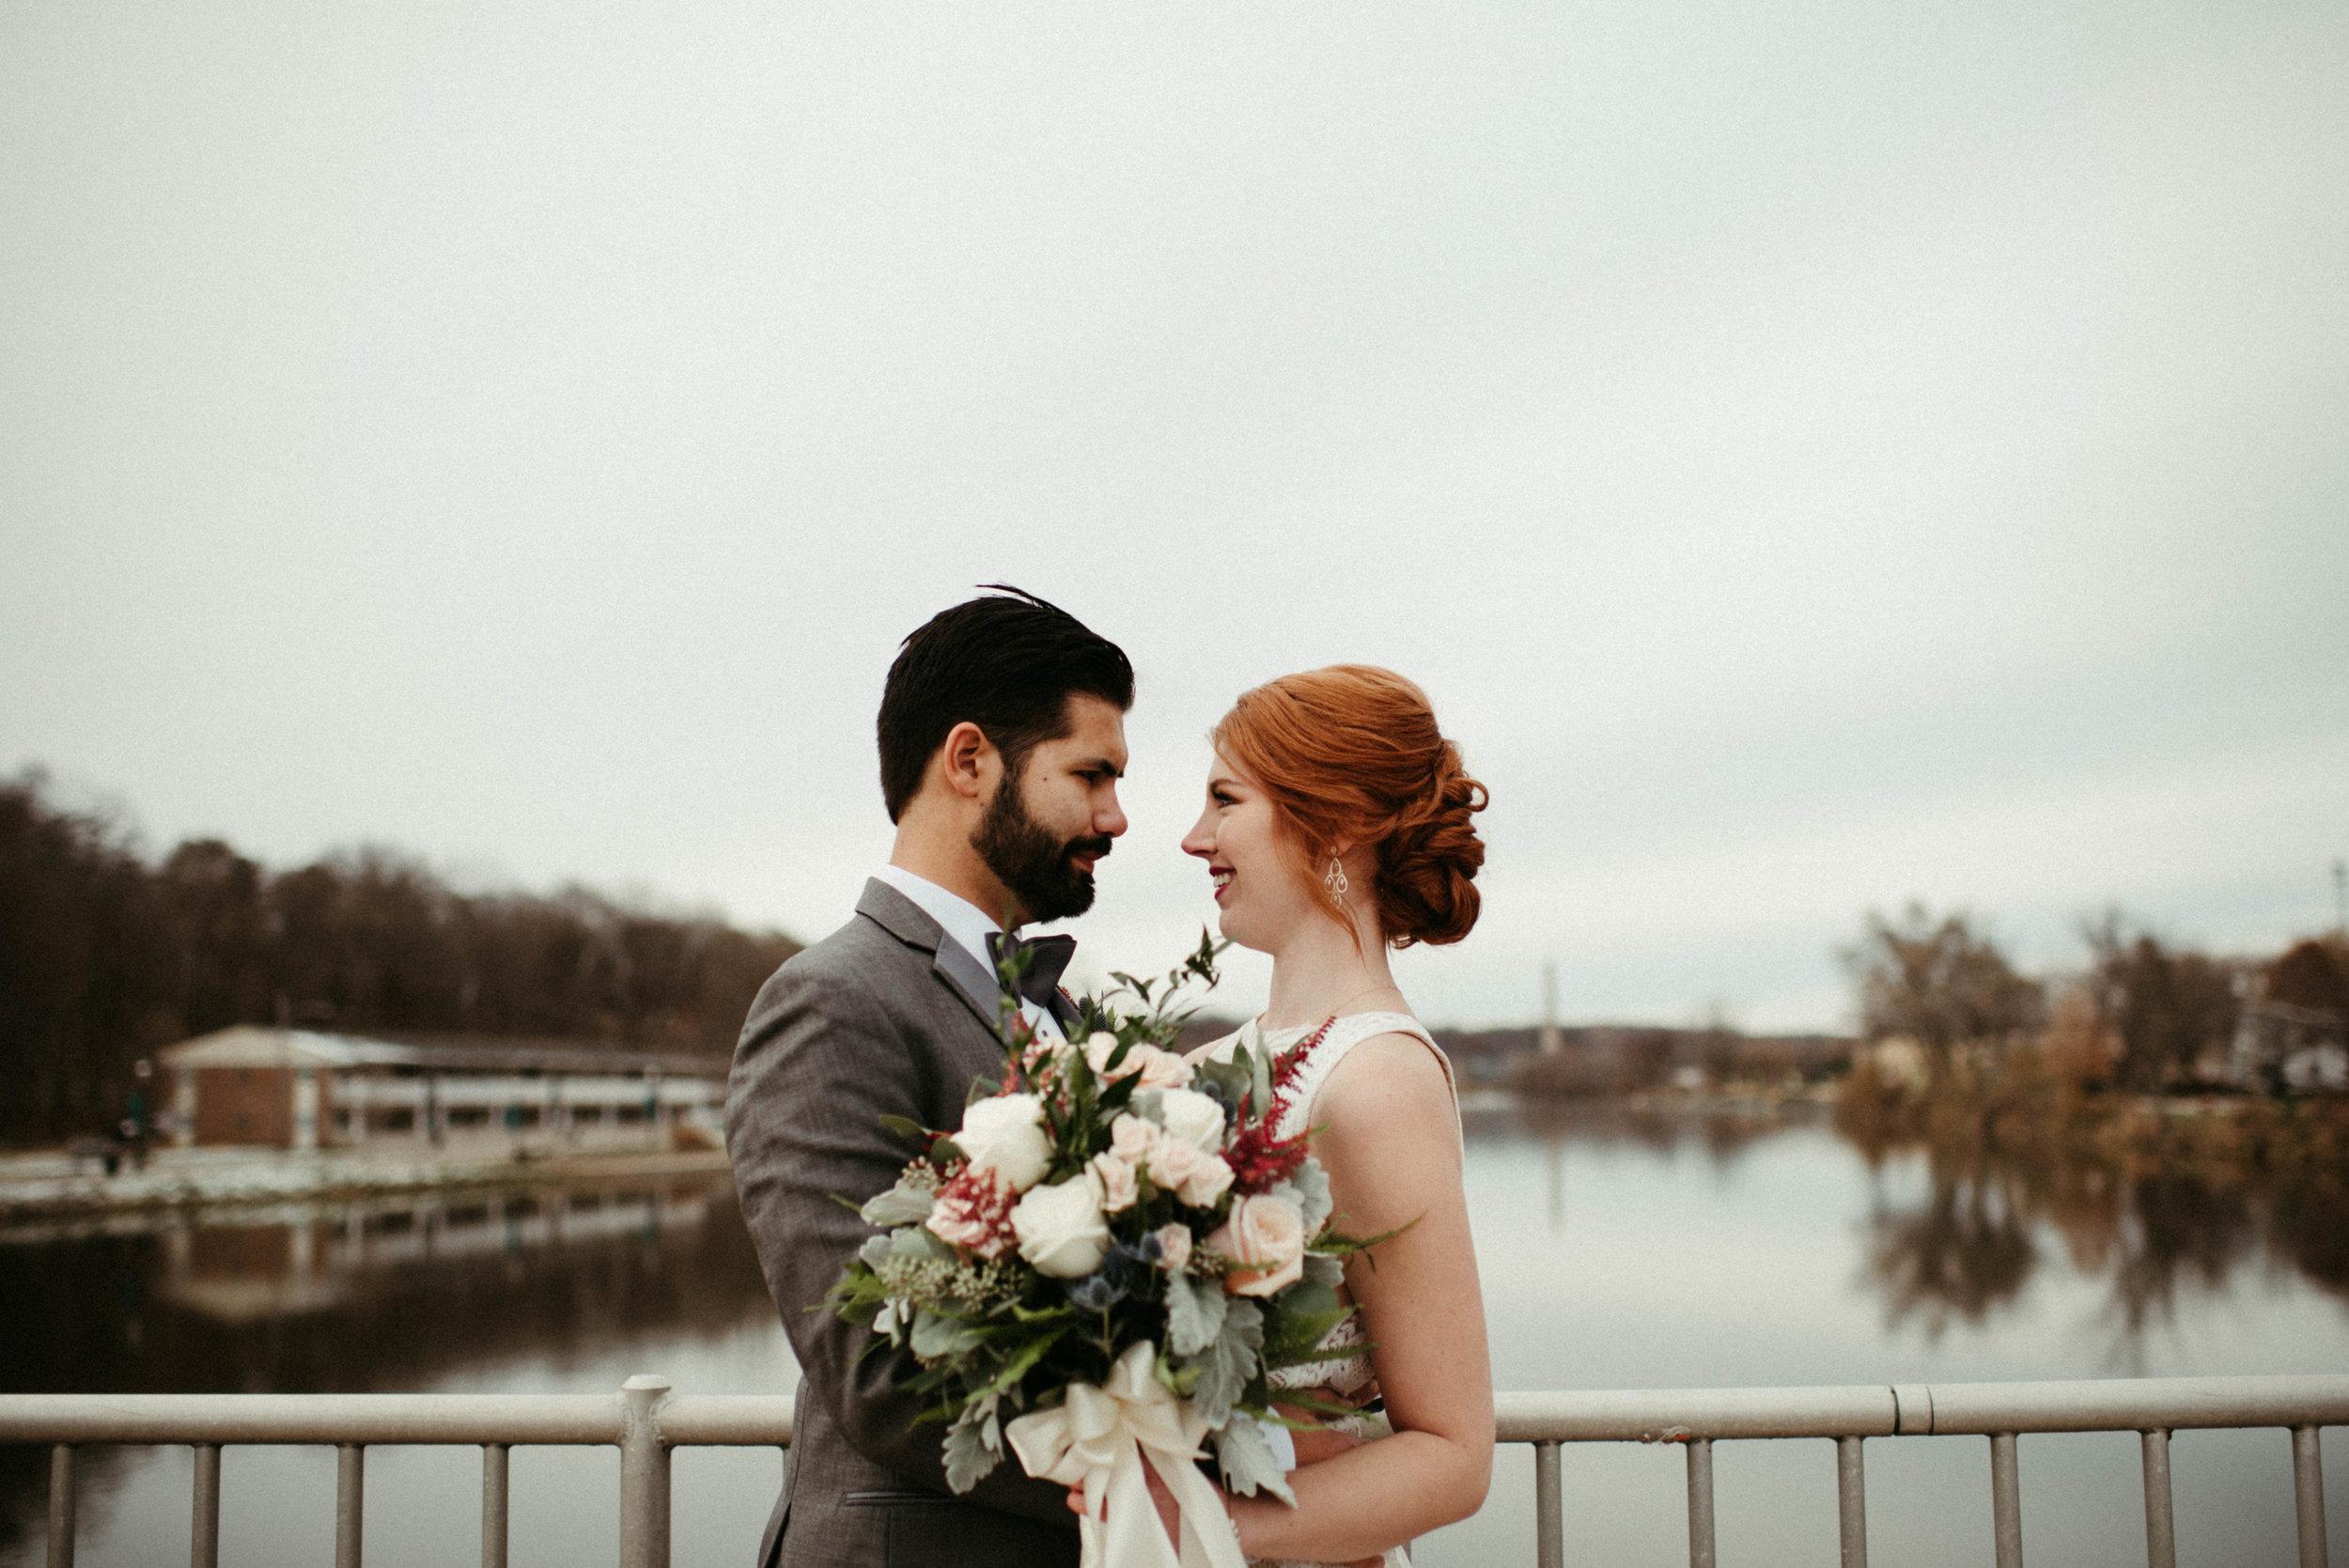 The Brix on Fox, Chicago Wedding Photographer, Zach and Rosalie00035.jpg